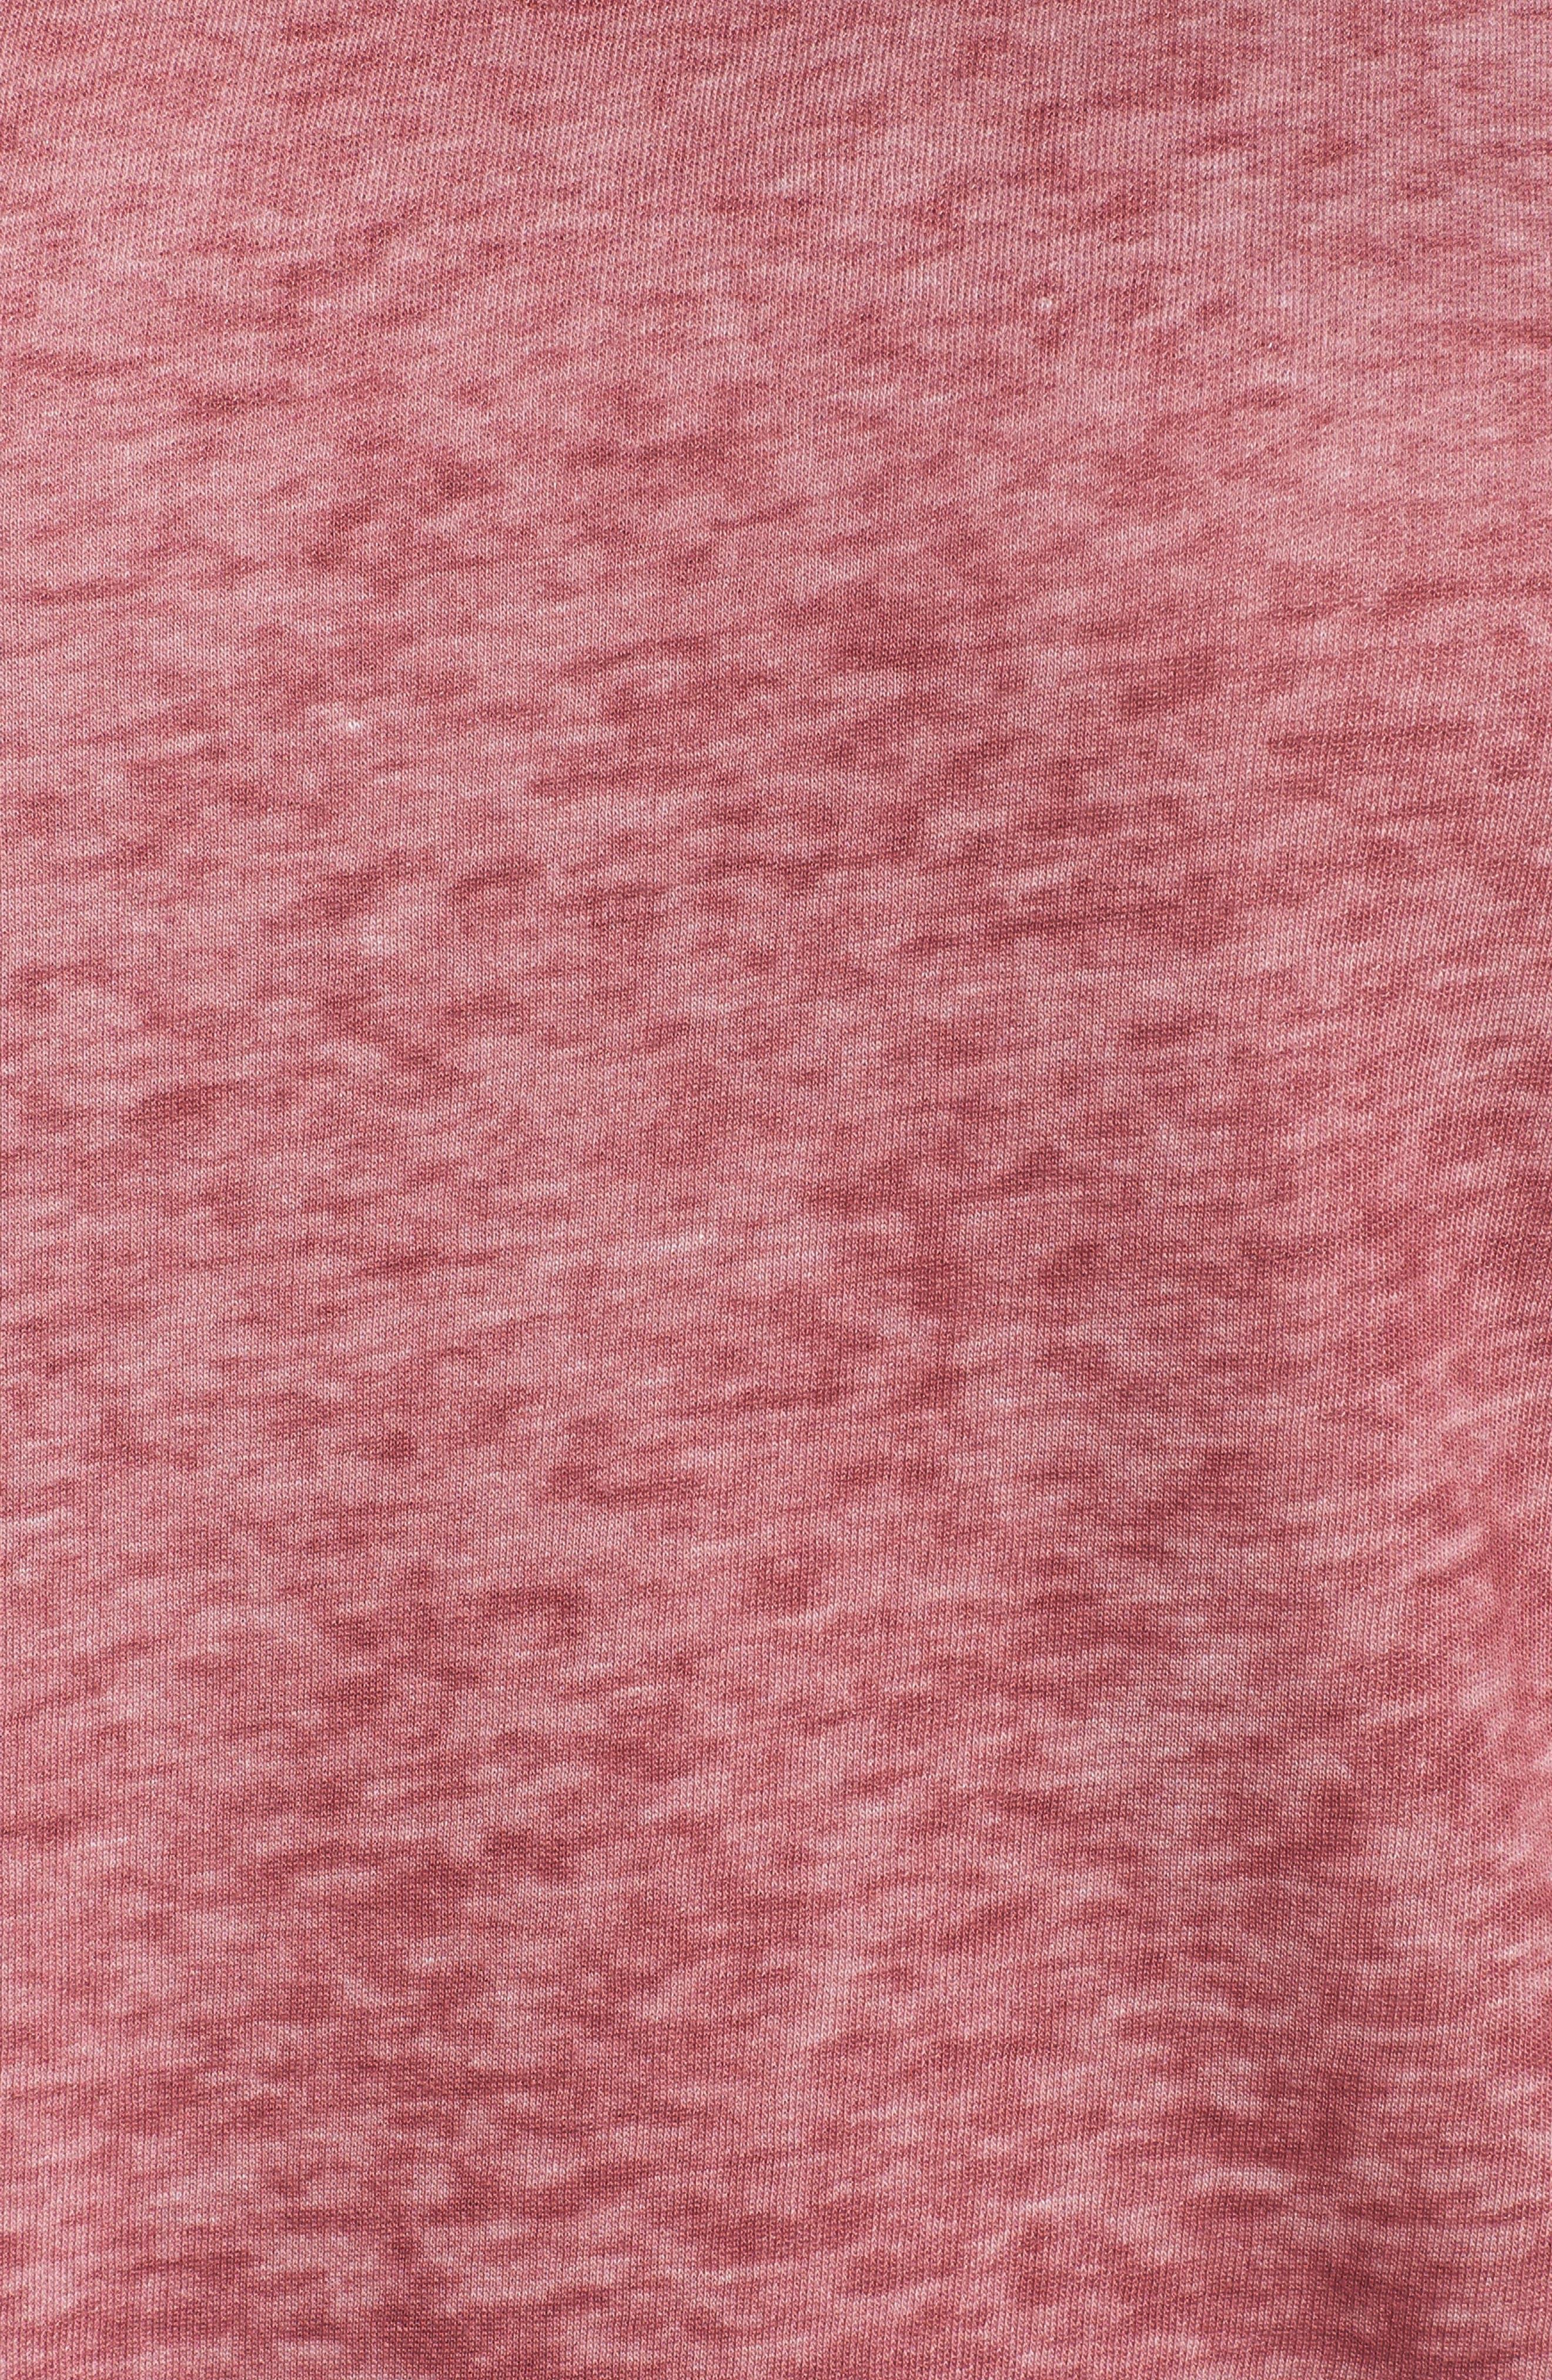 Pleat Back Sweatshirt,                             Alternate thumbnail 5, color,                             Burgundy Thorn